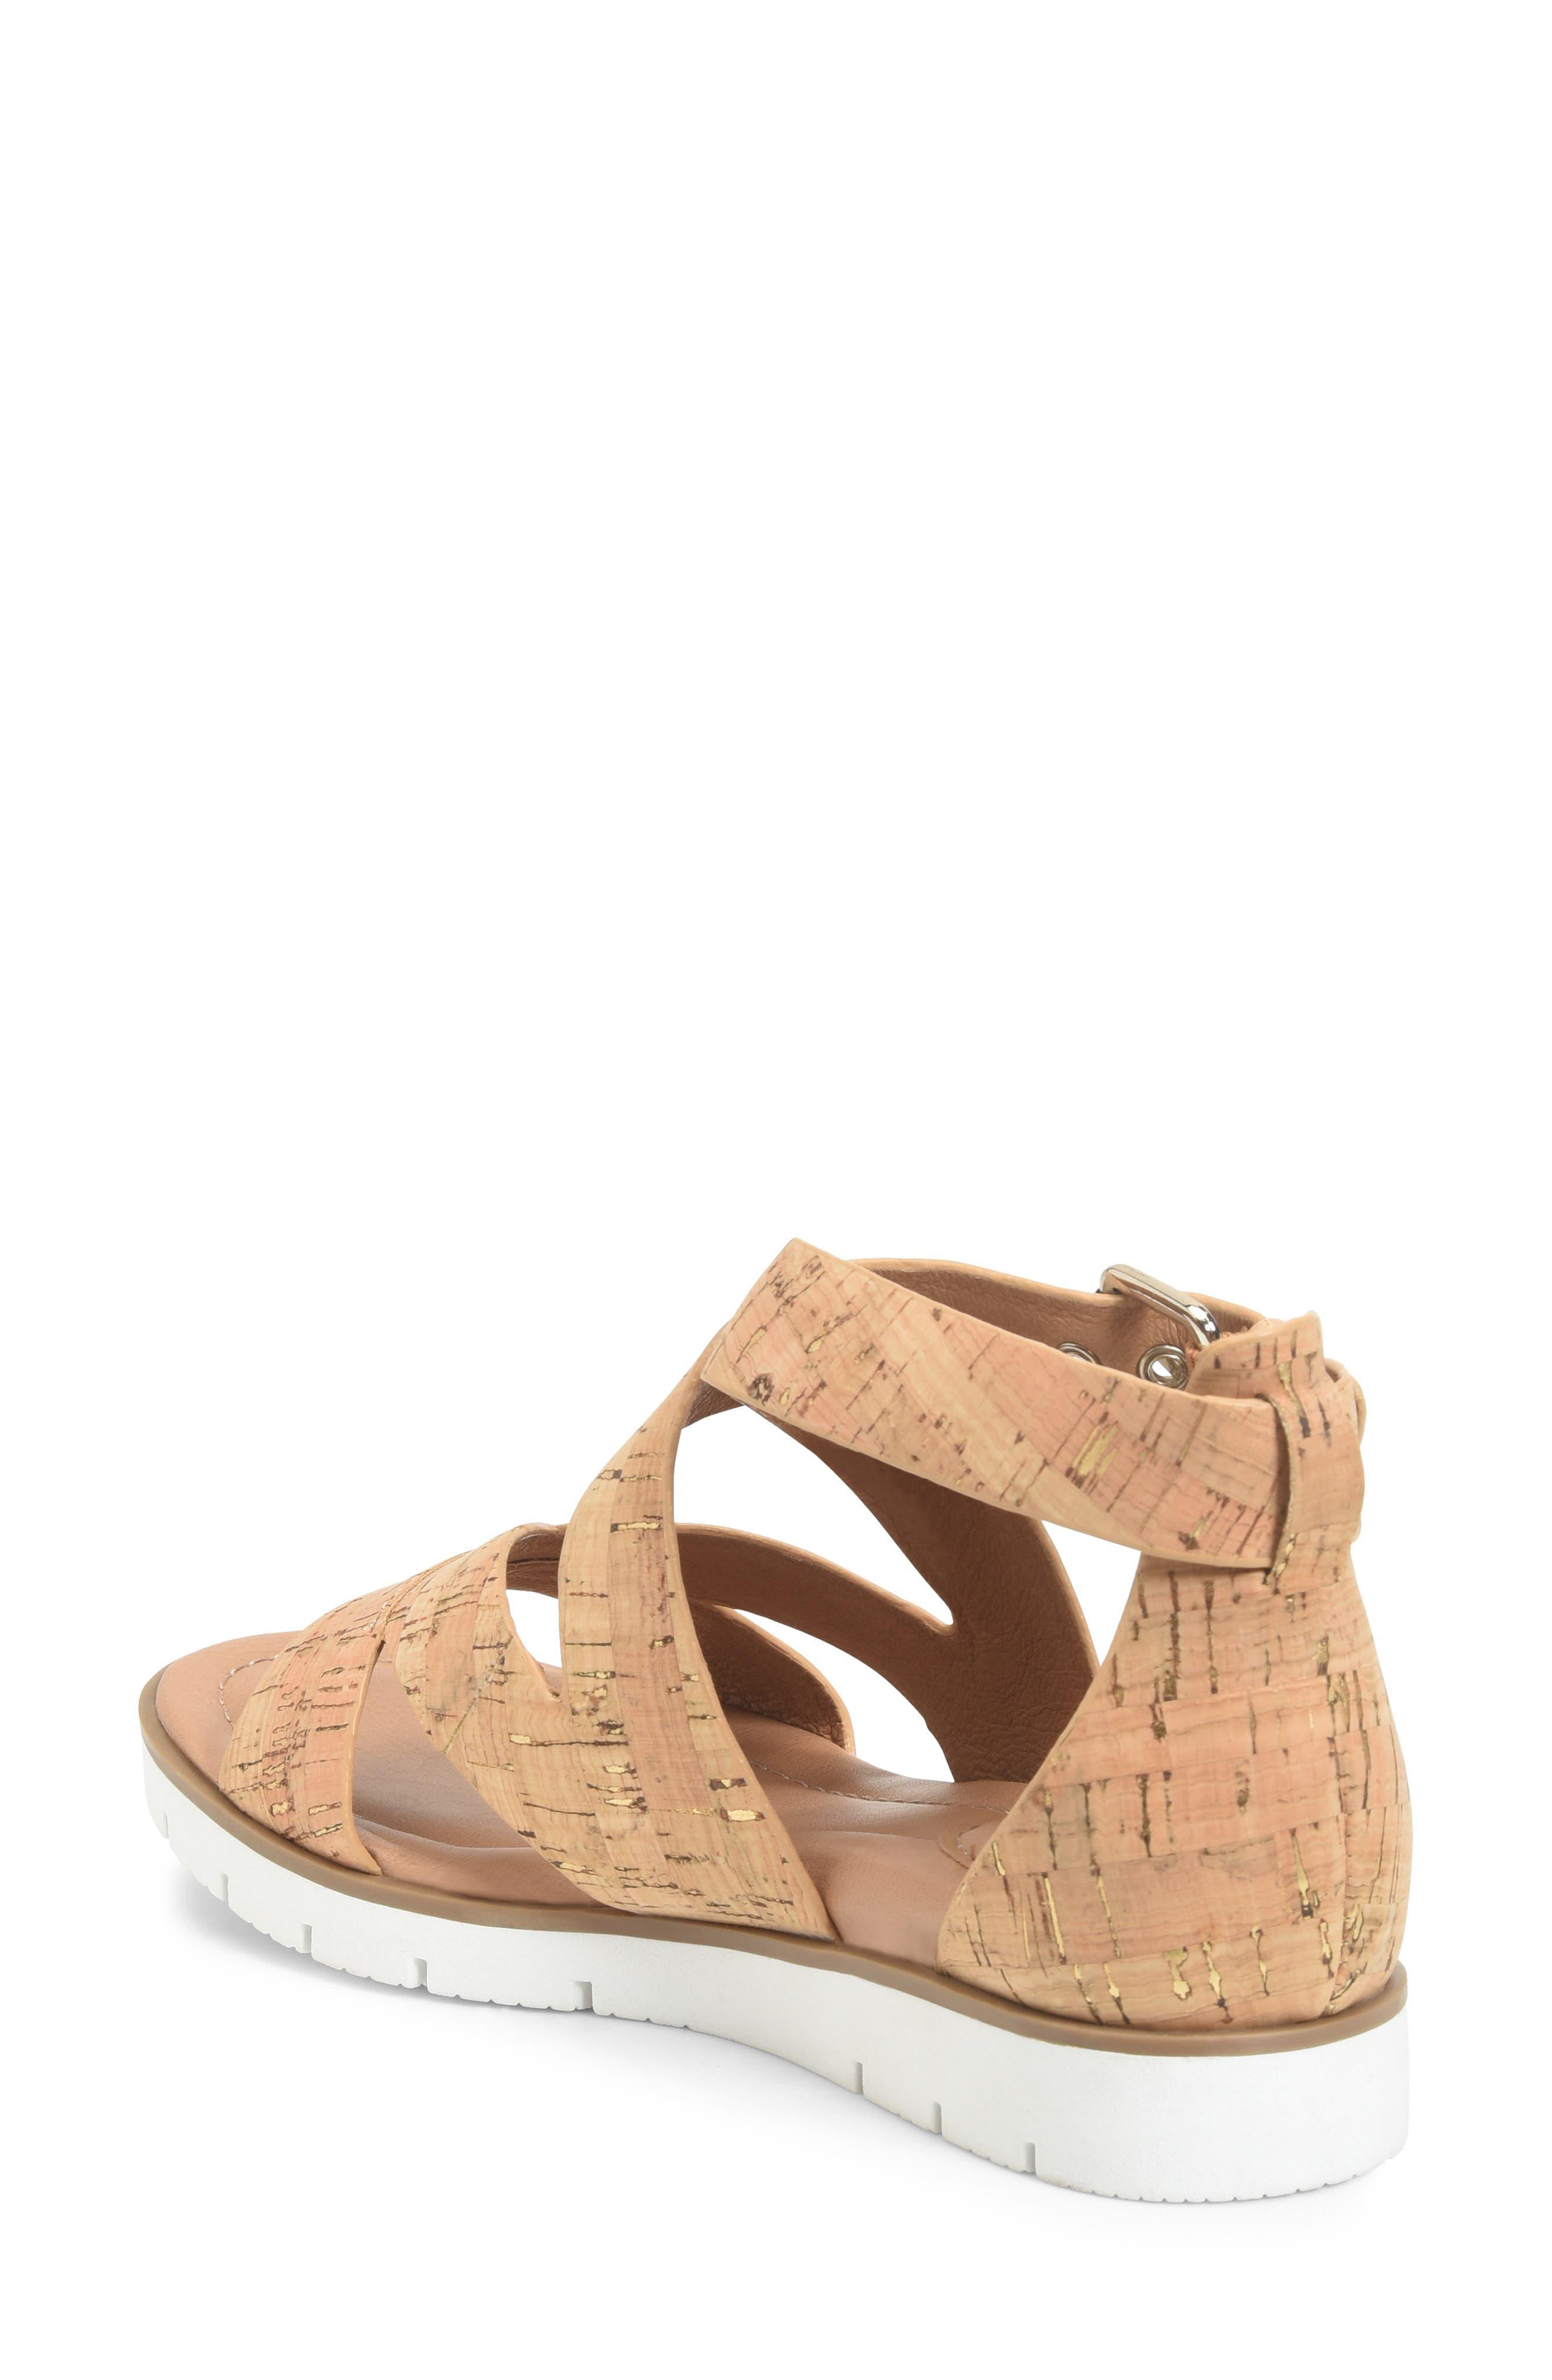 fc6b072d88f4 Women s Söfft Shoes